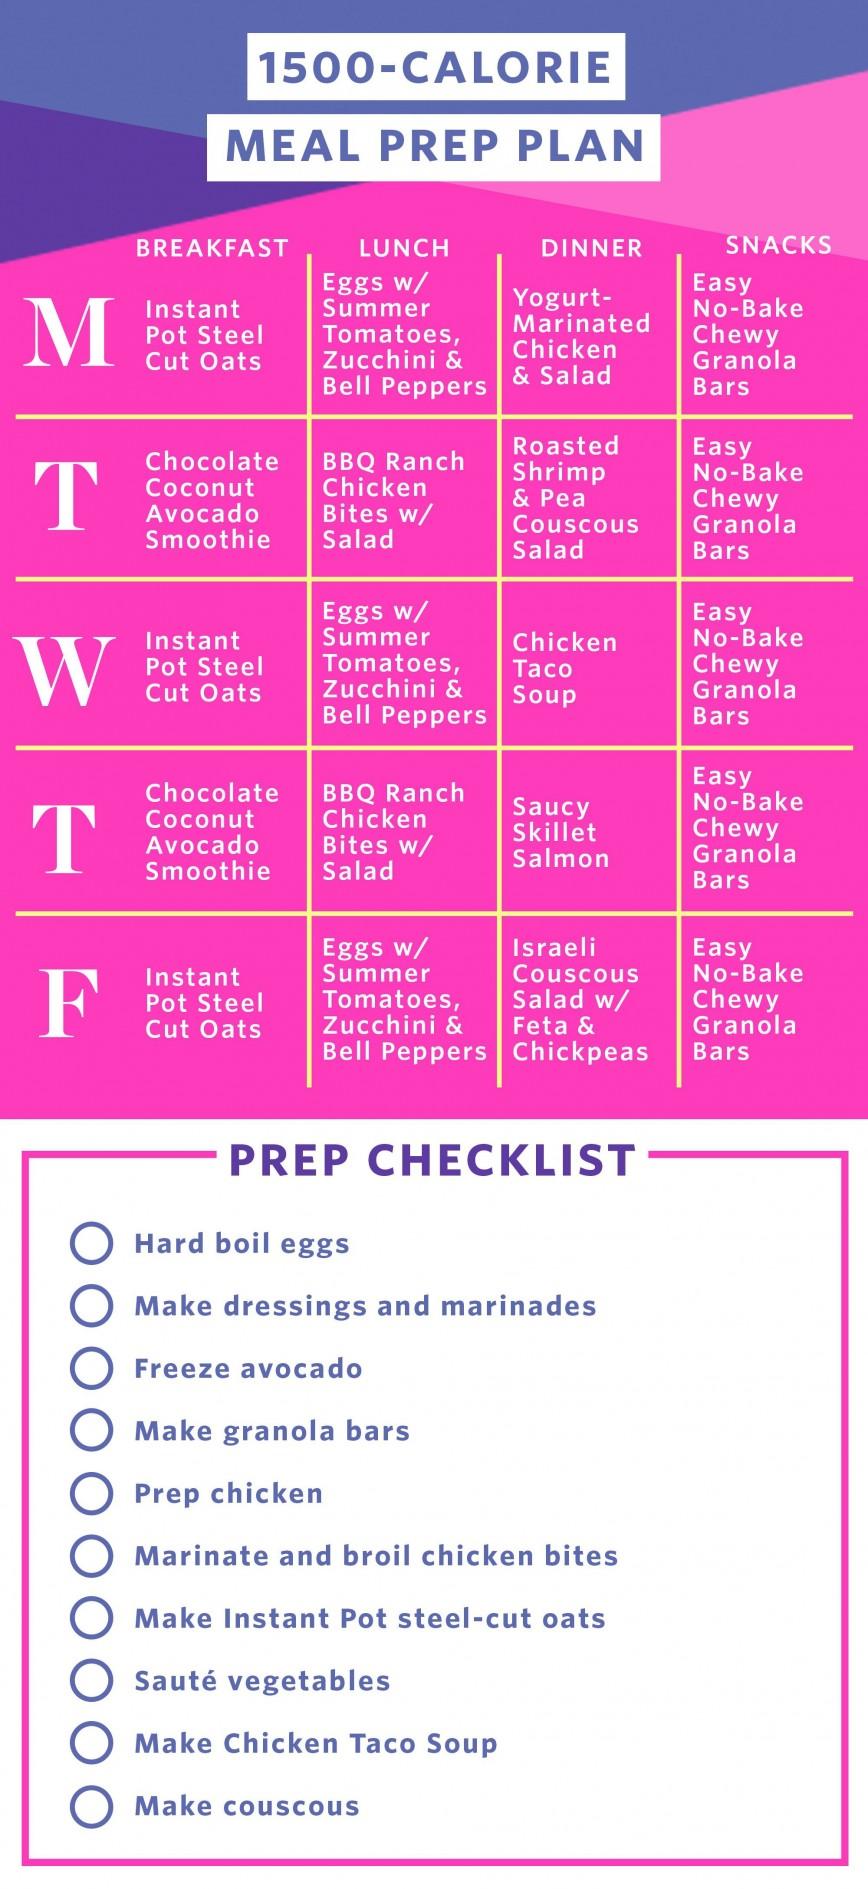 004 Unbelievable Sample 1500 Calorie Meal Plan Pdf Idea